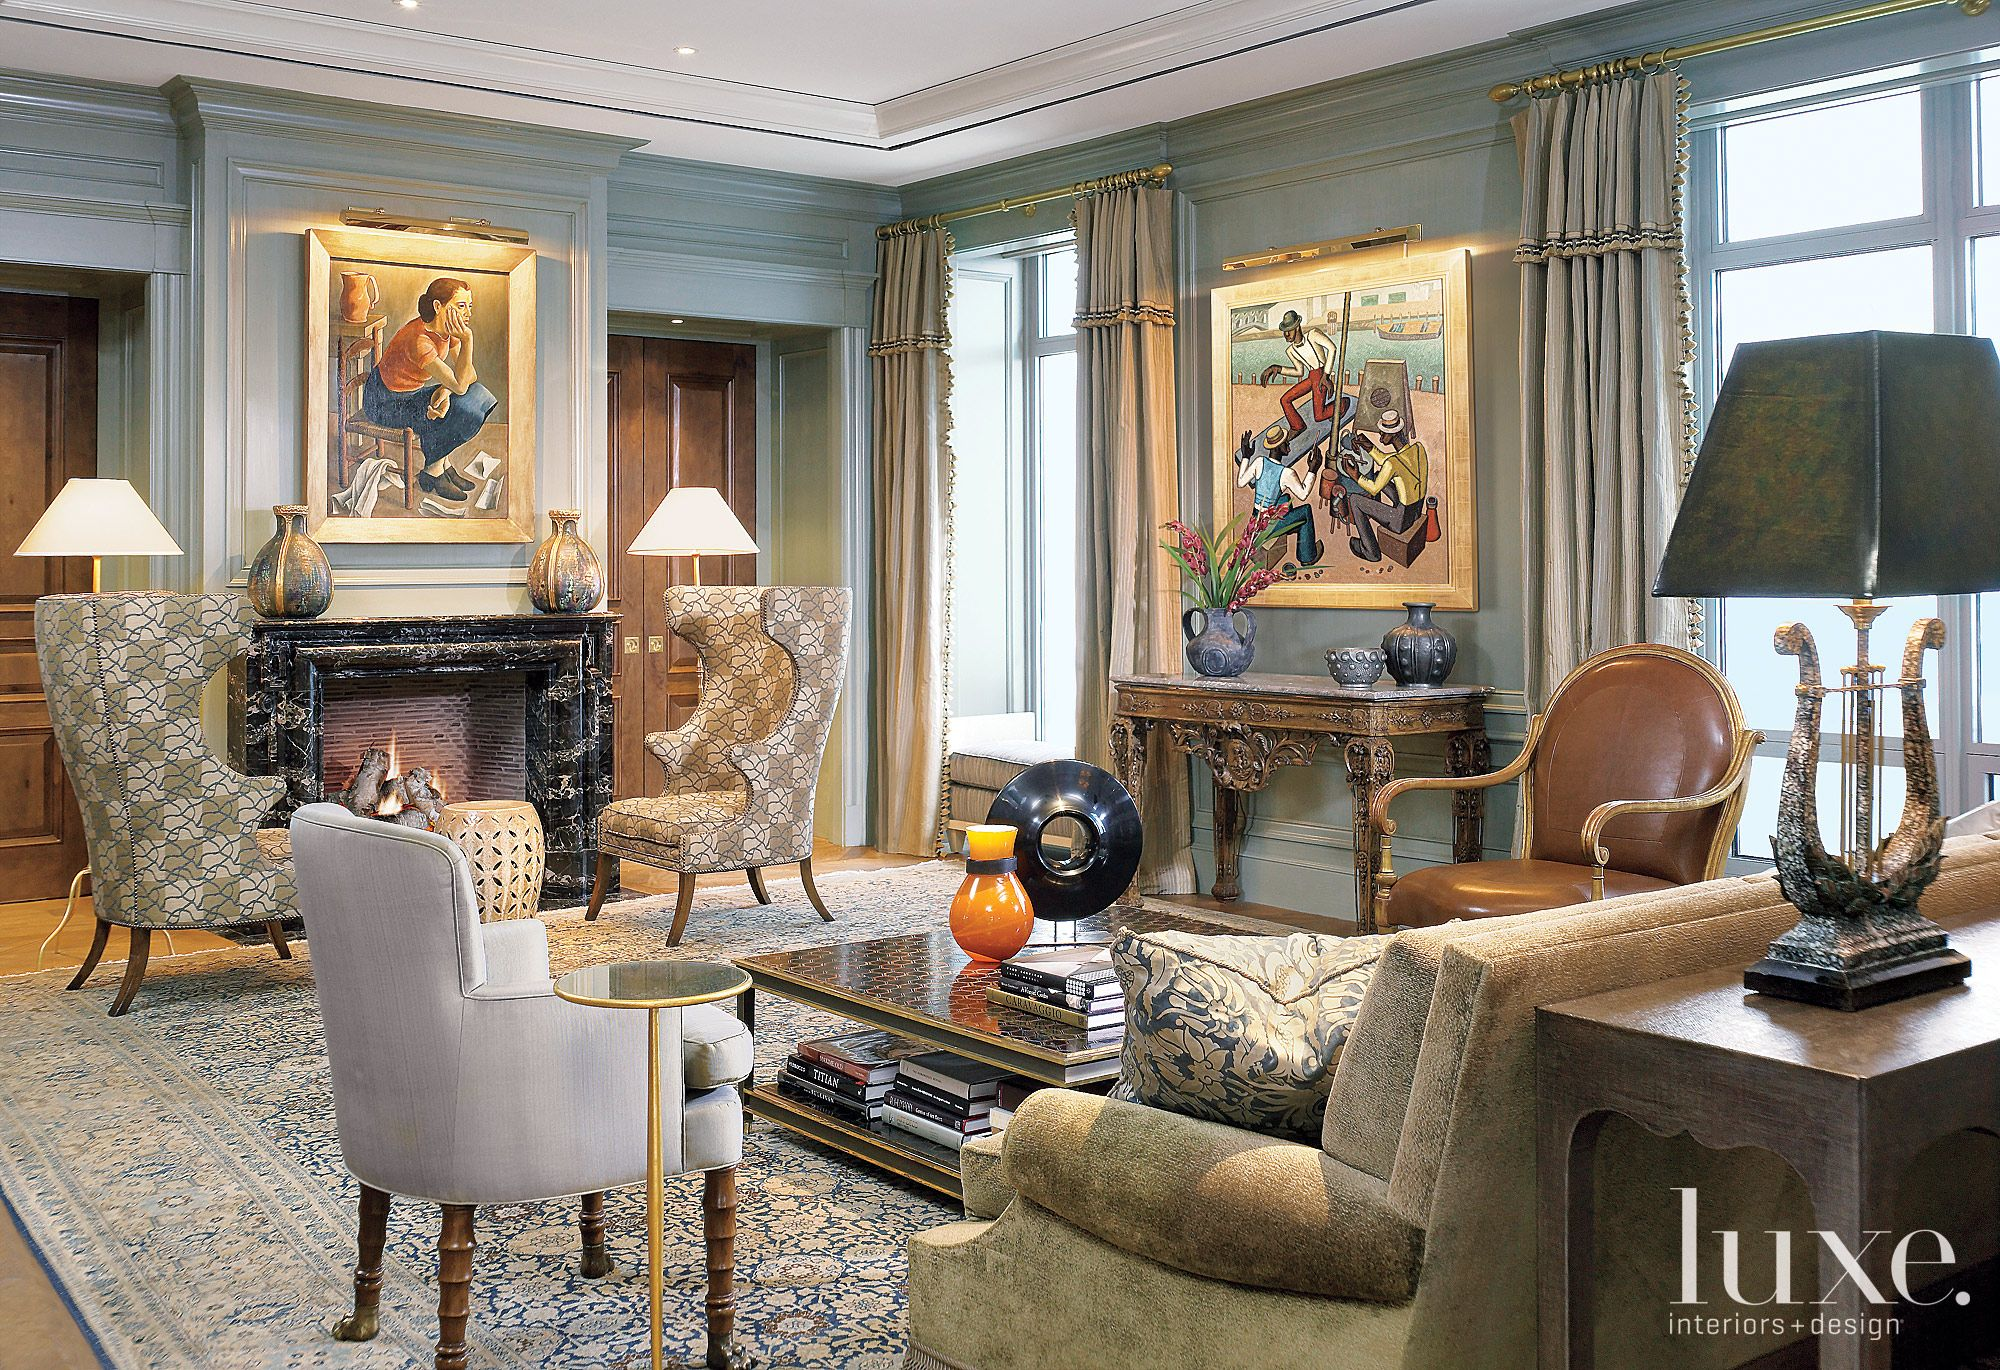 Interior Designer Jessica Lagrange And Architect Lucien Lagrange Had The Job Of Making This Home